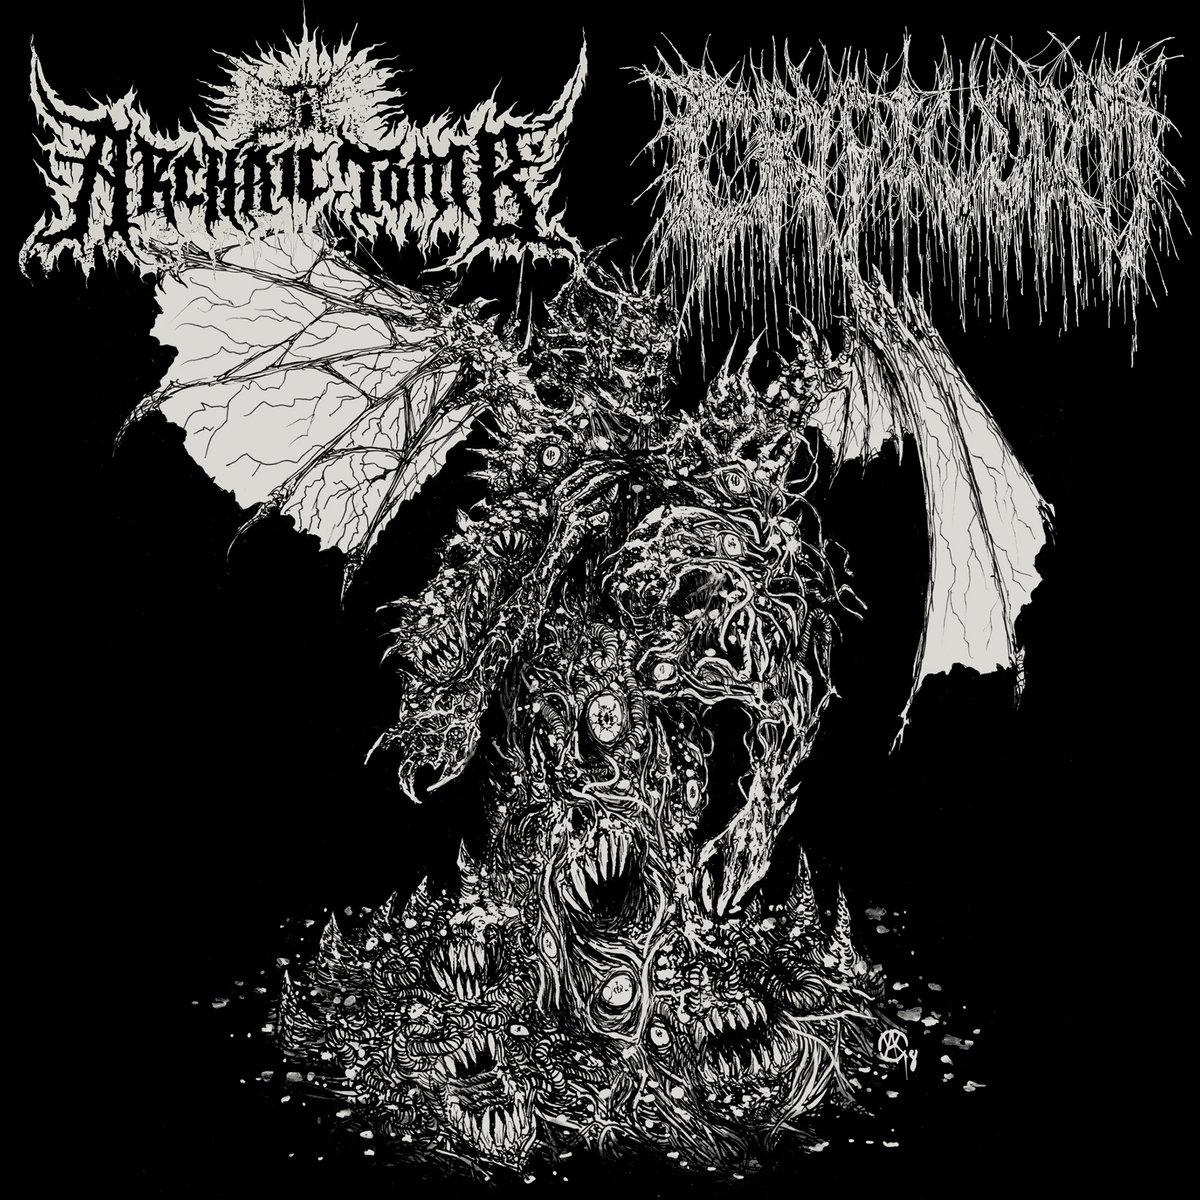 archaic tomb / cryptworm – persecution paraphrenalia / putrefactive regurgitation [split]